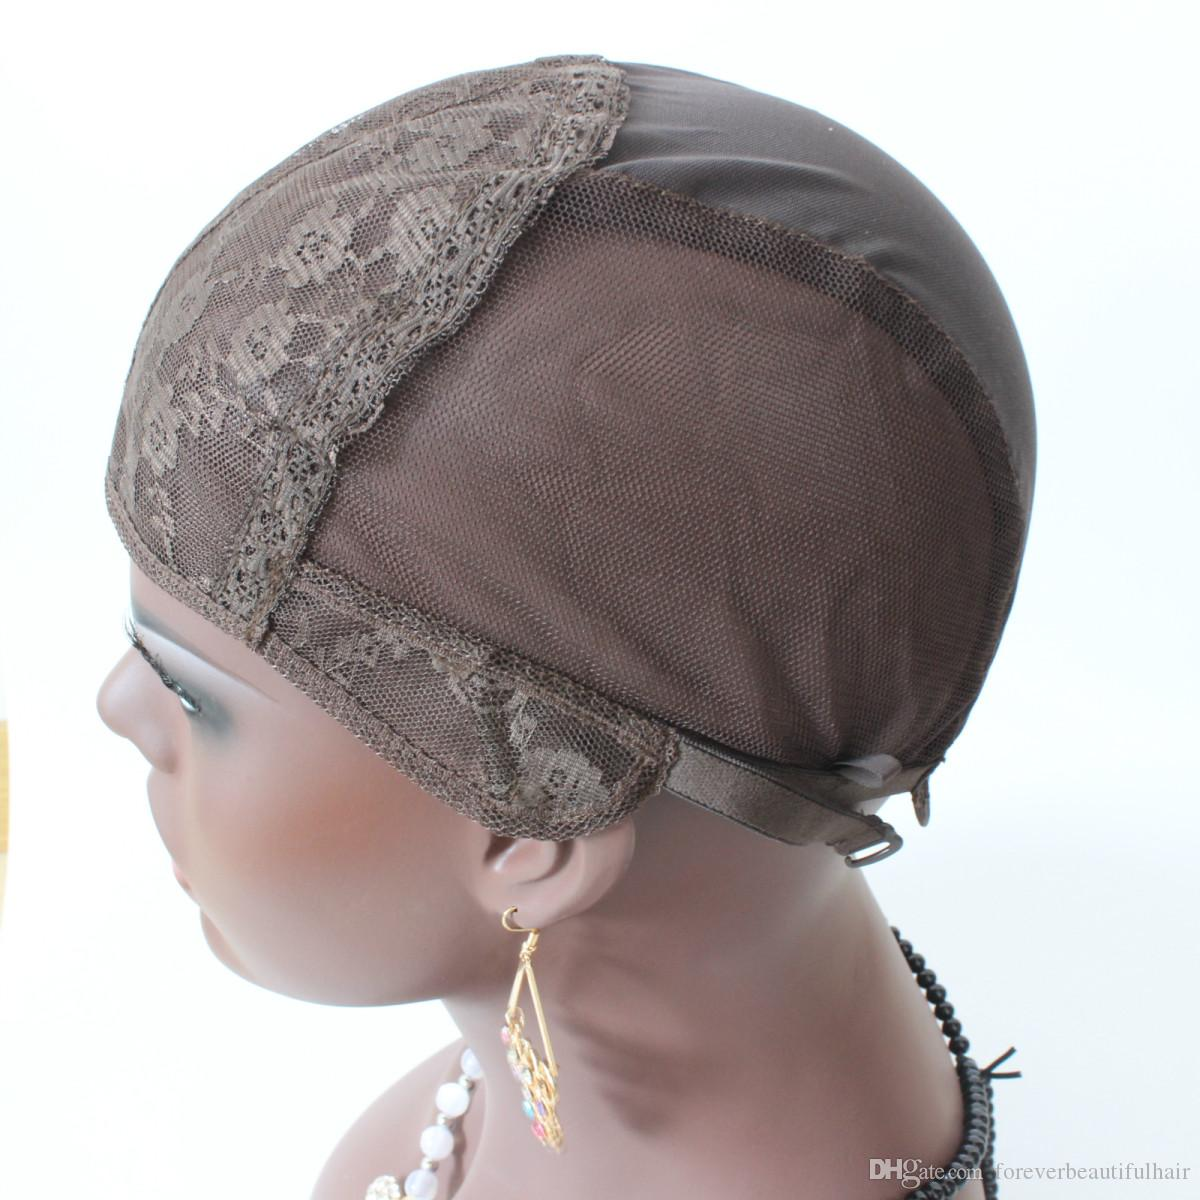 Jewish Wig Cap Brown Color S / M / L Glufteless Wig Caps för att göra peruker Stretch Lace Weaving Cap Justerbara band Medium Brown